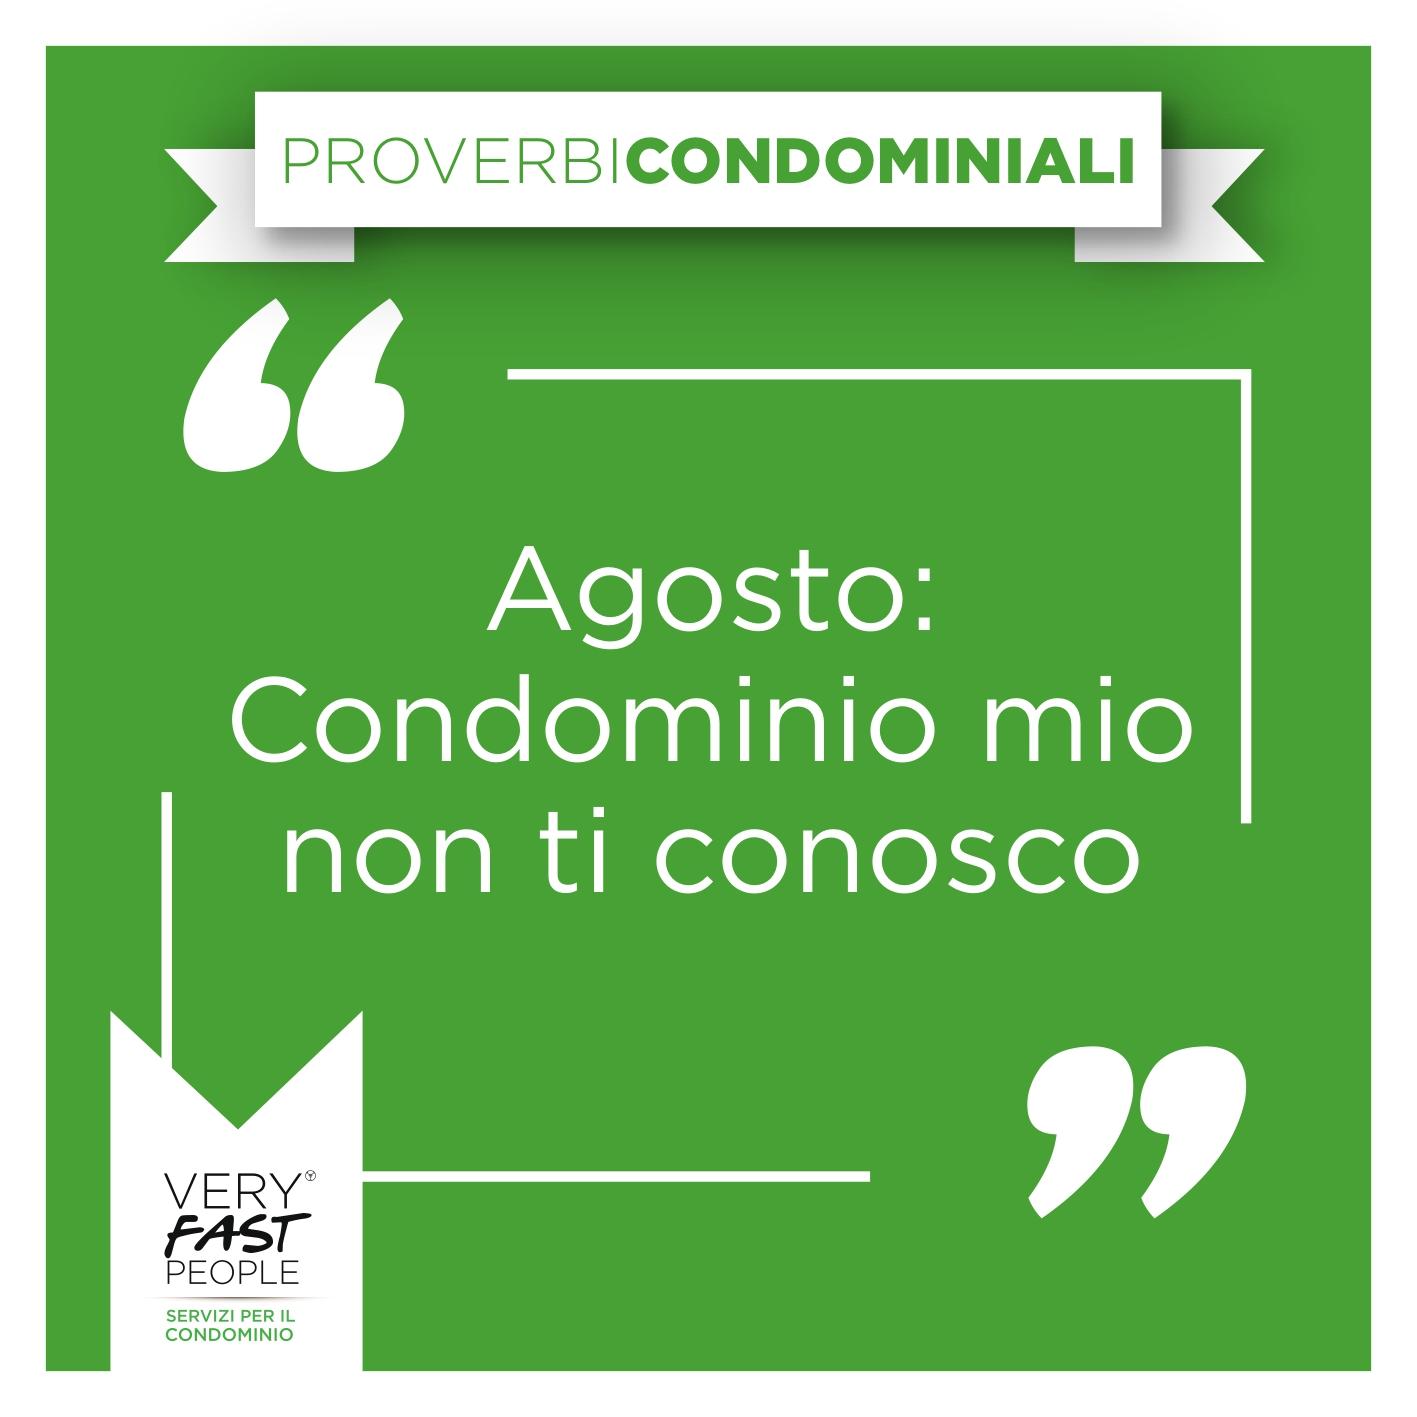 proverbi condominio